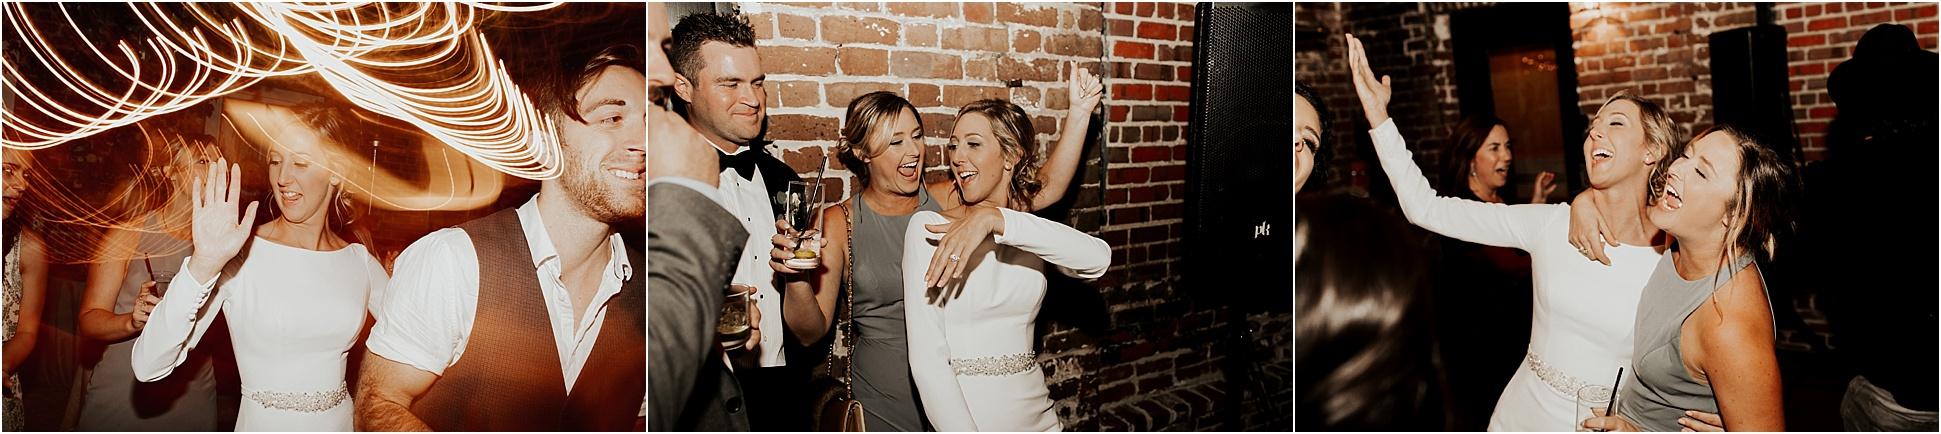 upstairs_midtown_intimate_charleston_wedding085.JPG